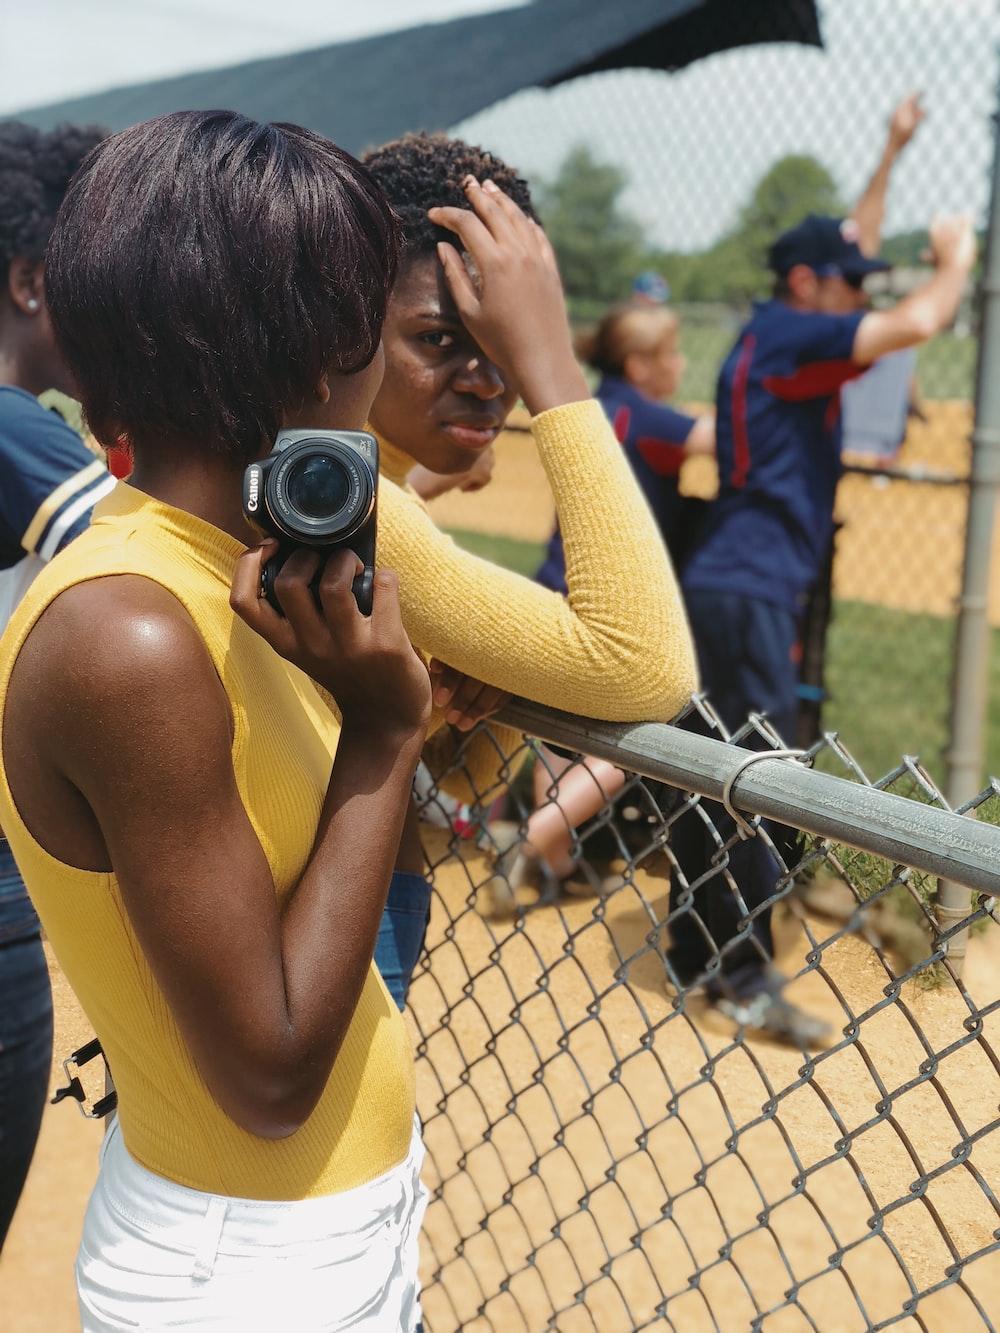 woman in yellow tank top holding black dslr camera